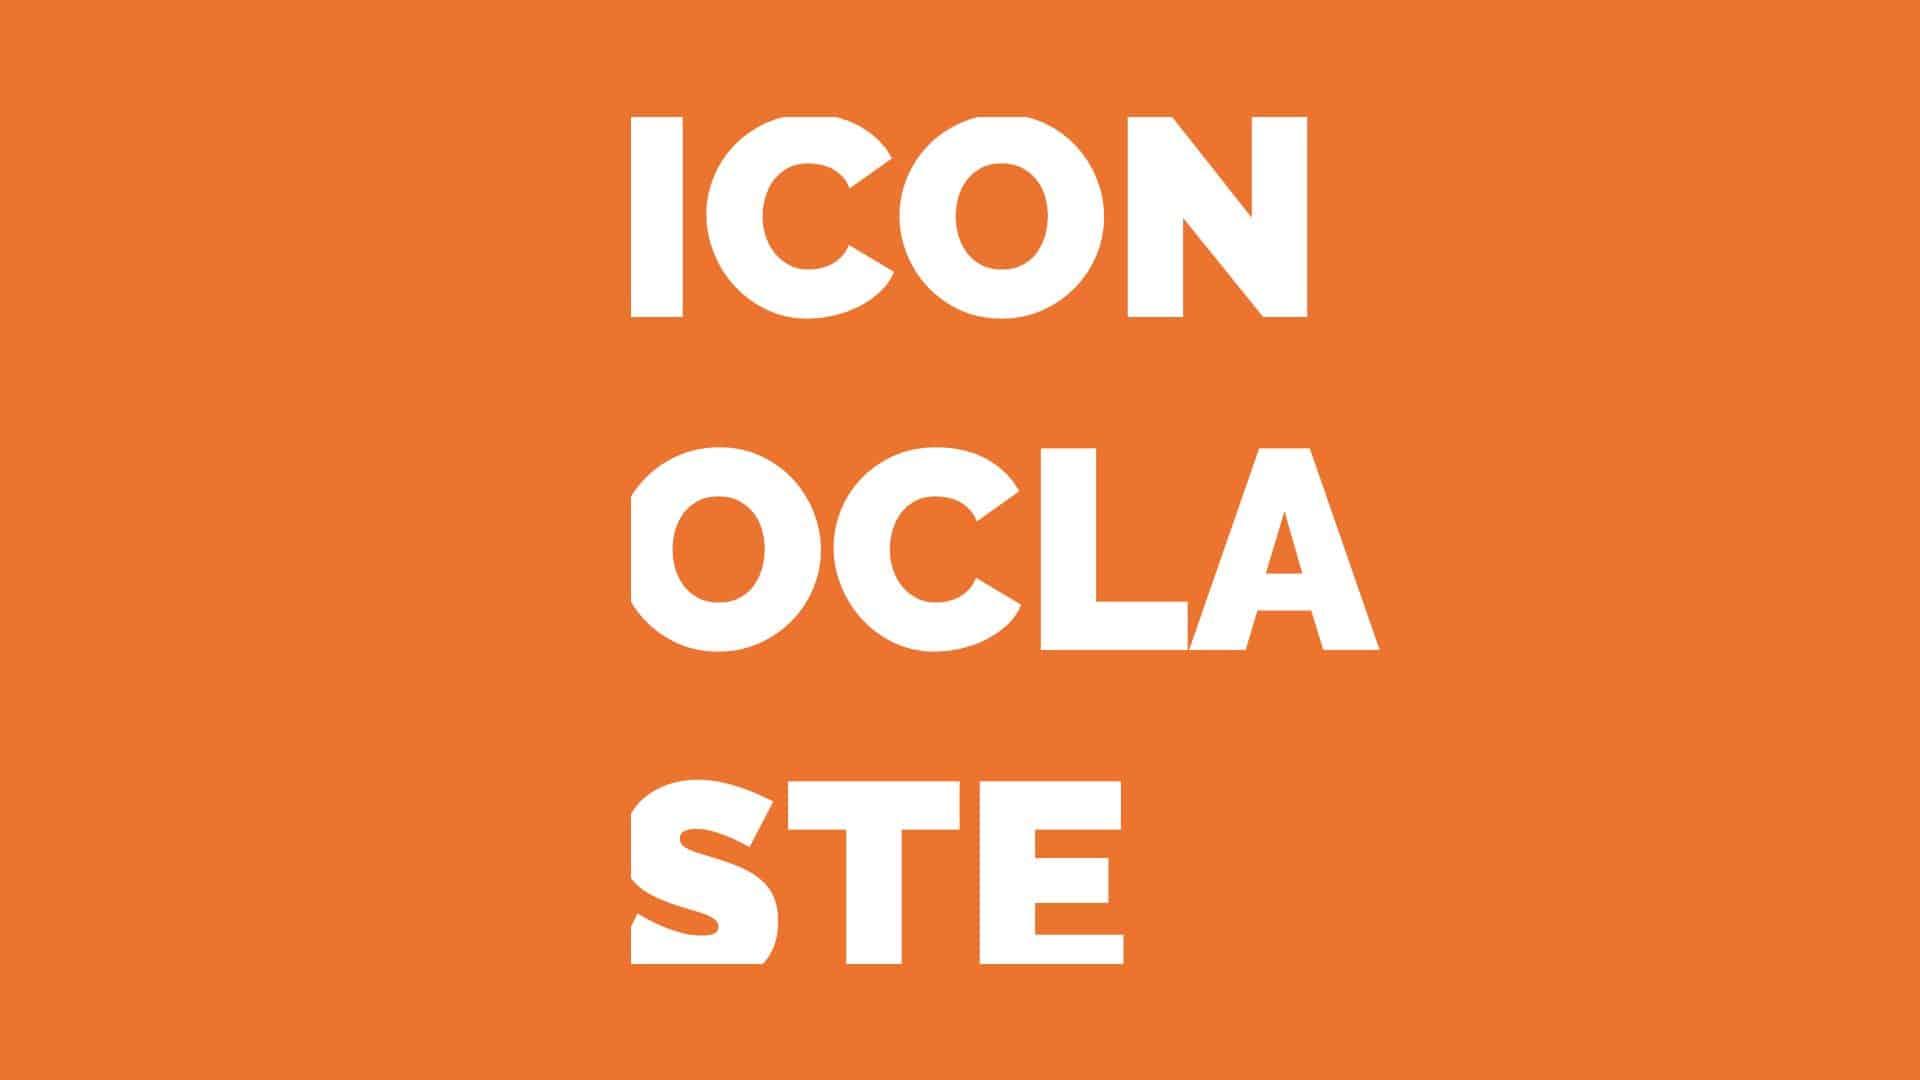 iconoclaste.001